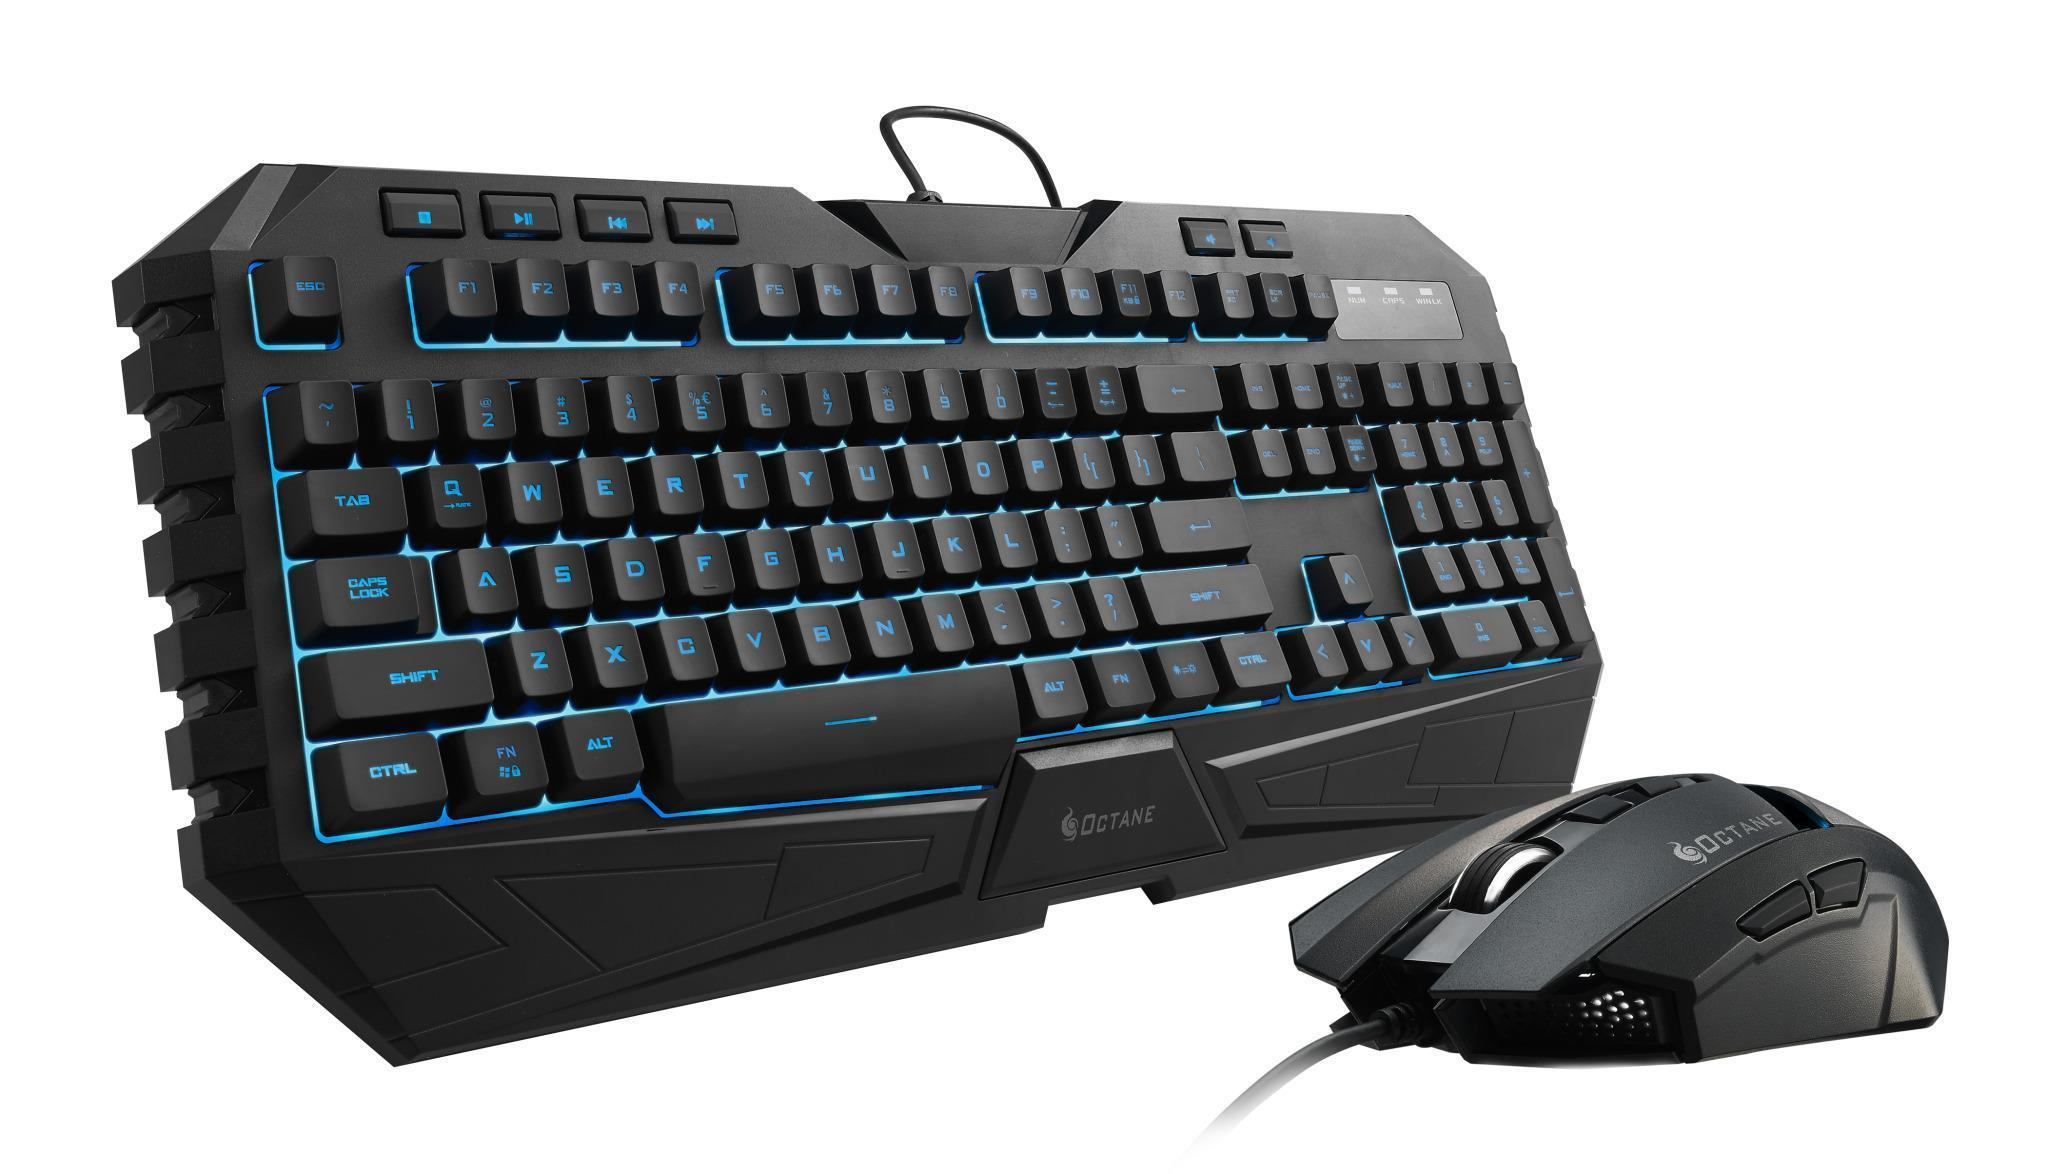 Cooler Master CM Storm Octane Gaming Gear Keyboard & Mouse Combo Bundle